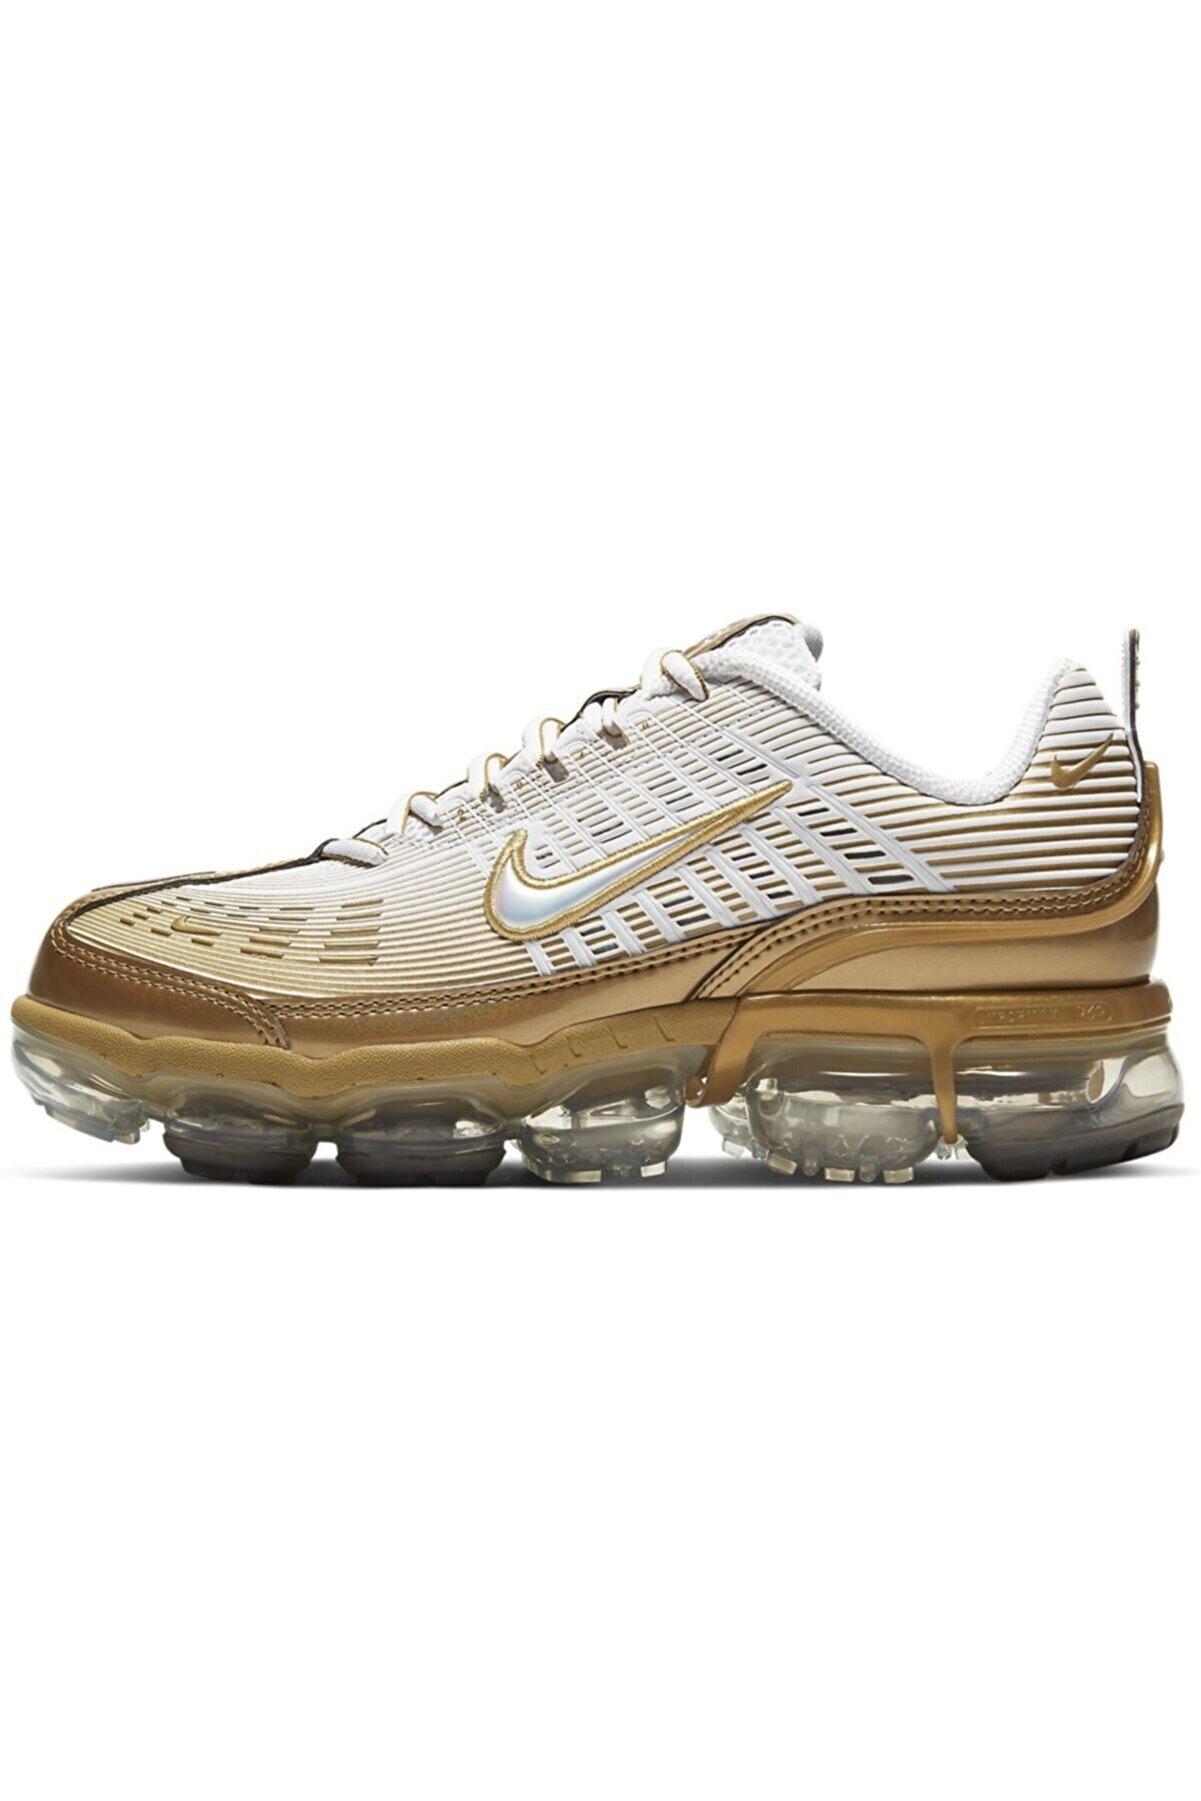 Nike Air Vapormax 360 Gold/white Kadın Spor Ayakkabı Ck9670-101